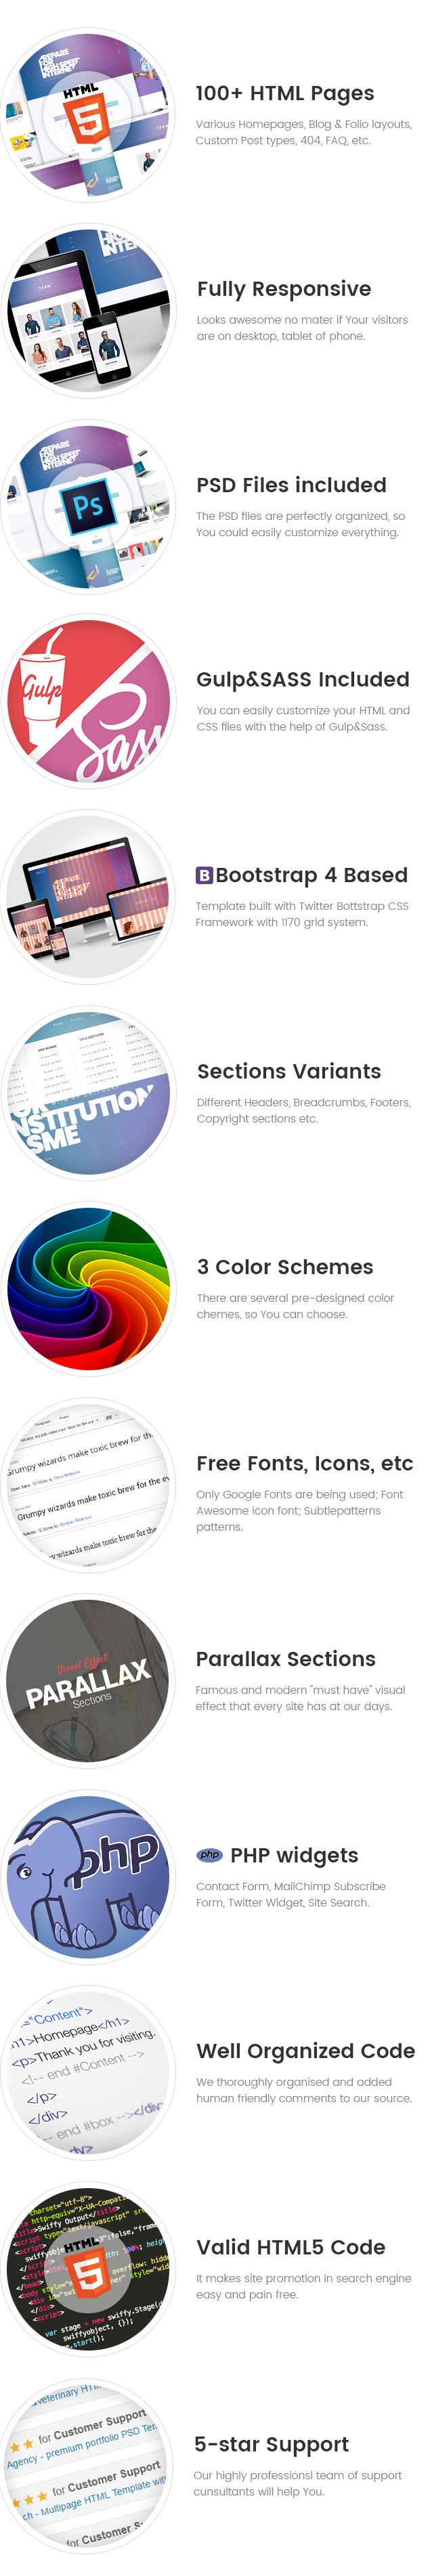 MaxiCom - Internet Provider HTML Template